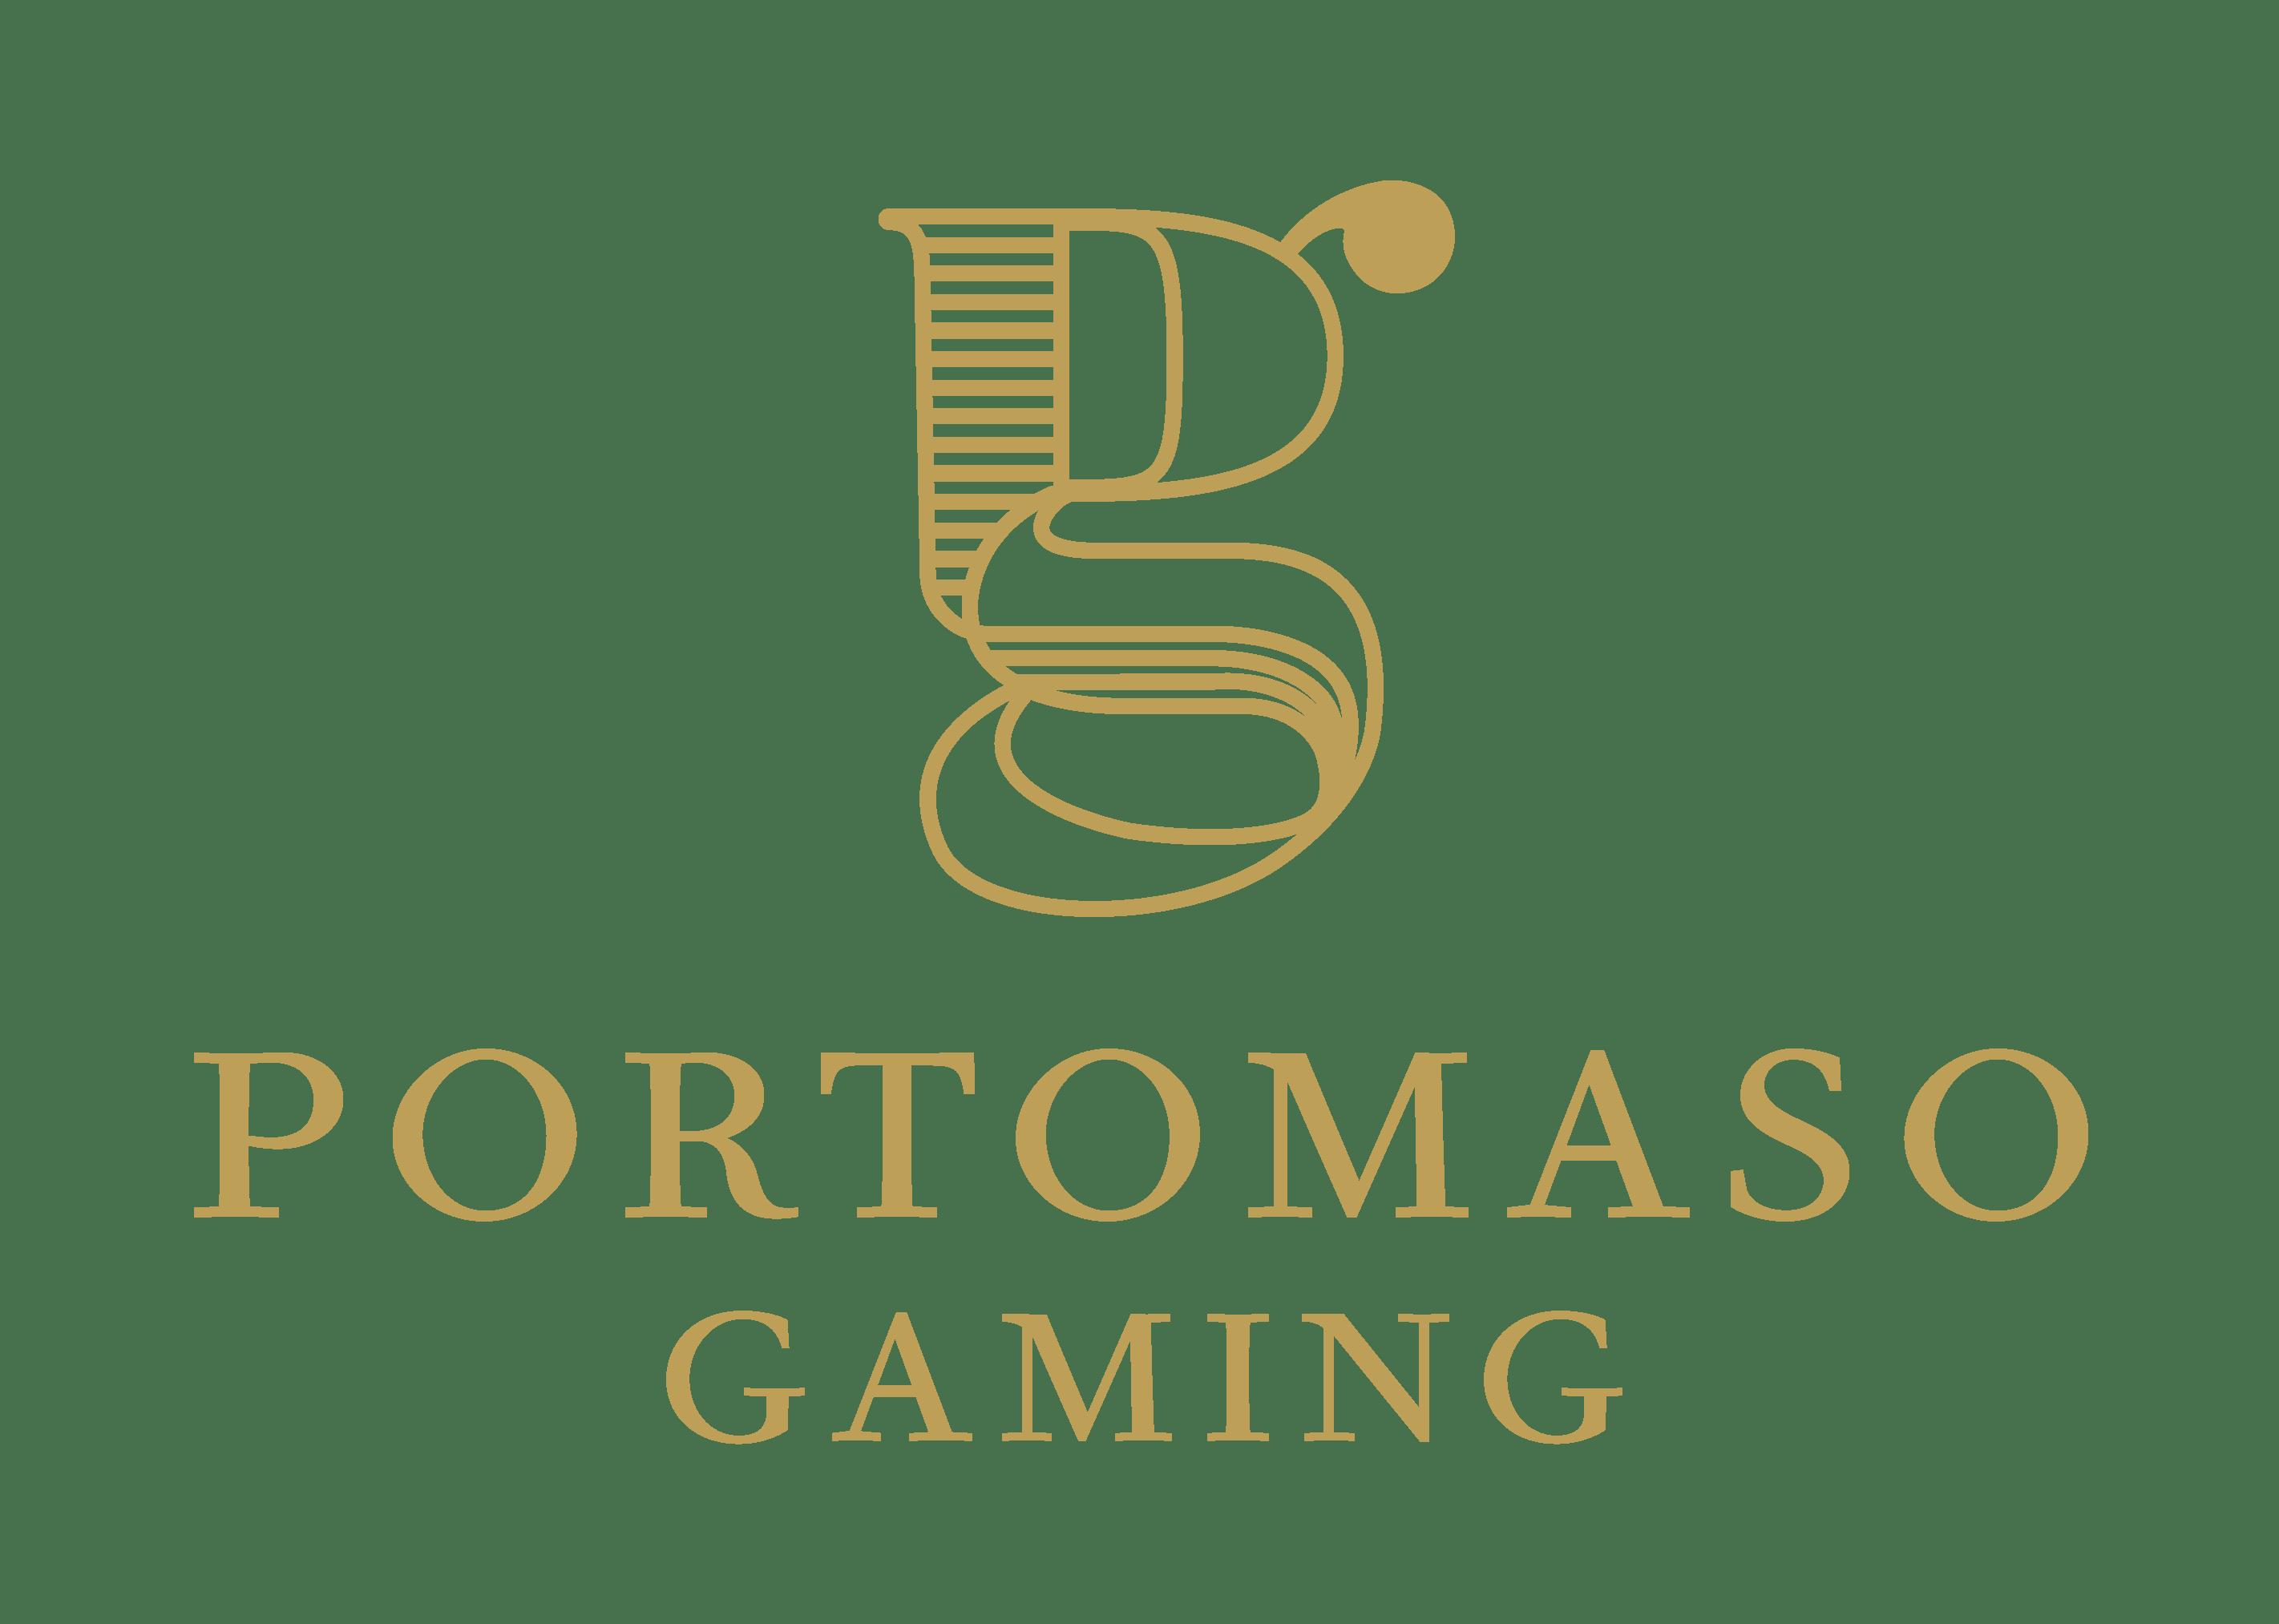 Portomaso Gaming jeux